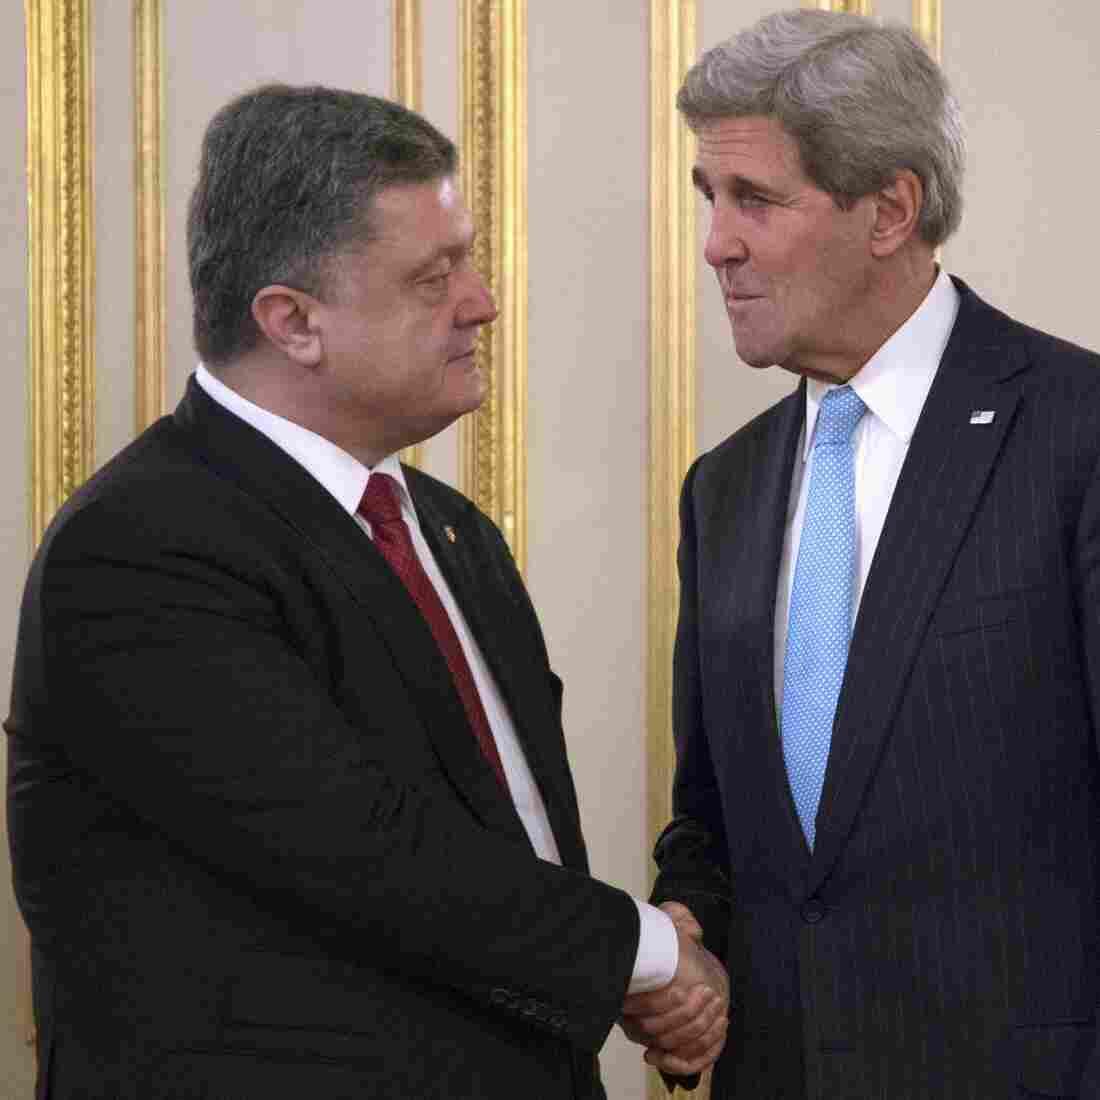 U.S. And NATO Seek New Ways To Help Secure Ukraine's Border